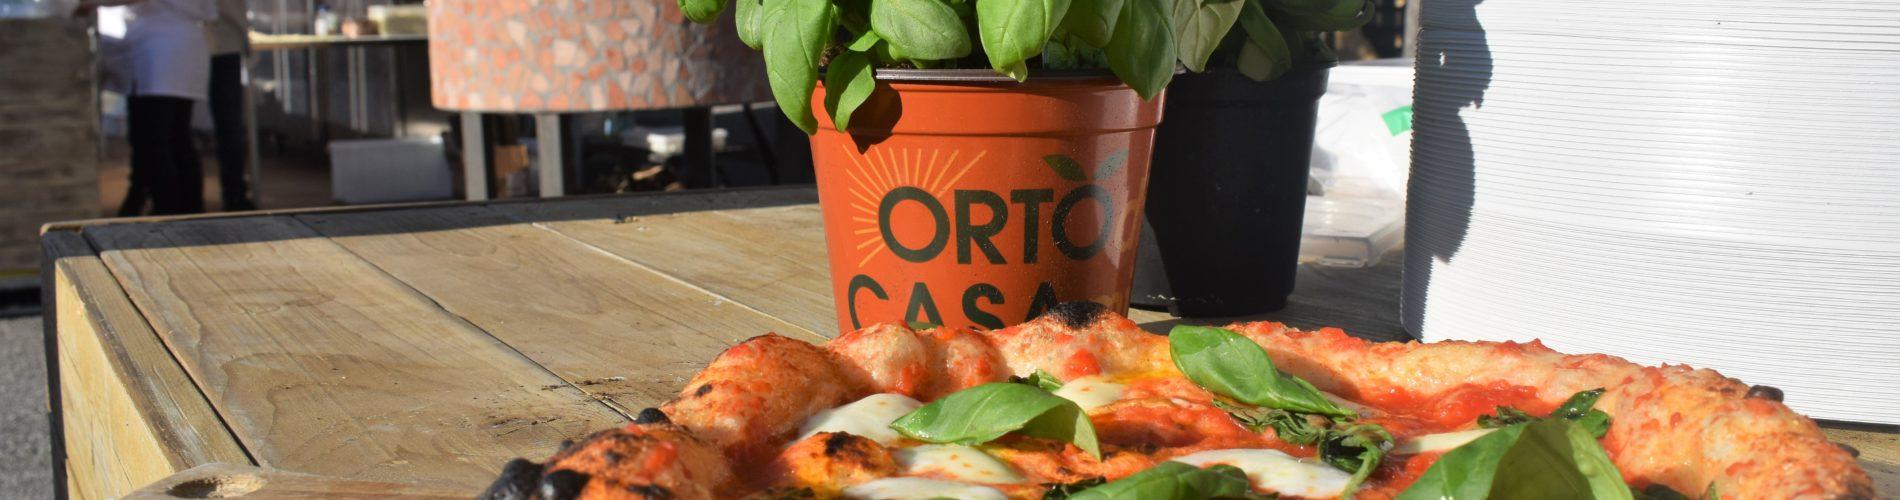 Pizza margherita dei fratelli d'auria pisa panuozzo al pizza pisa festival